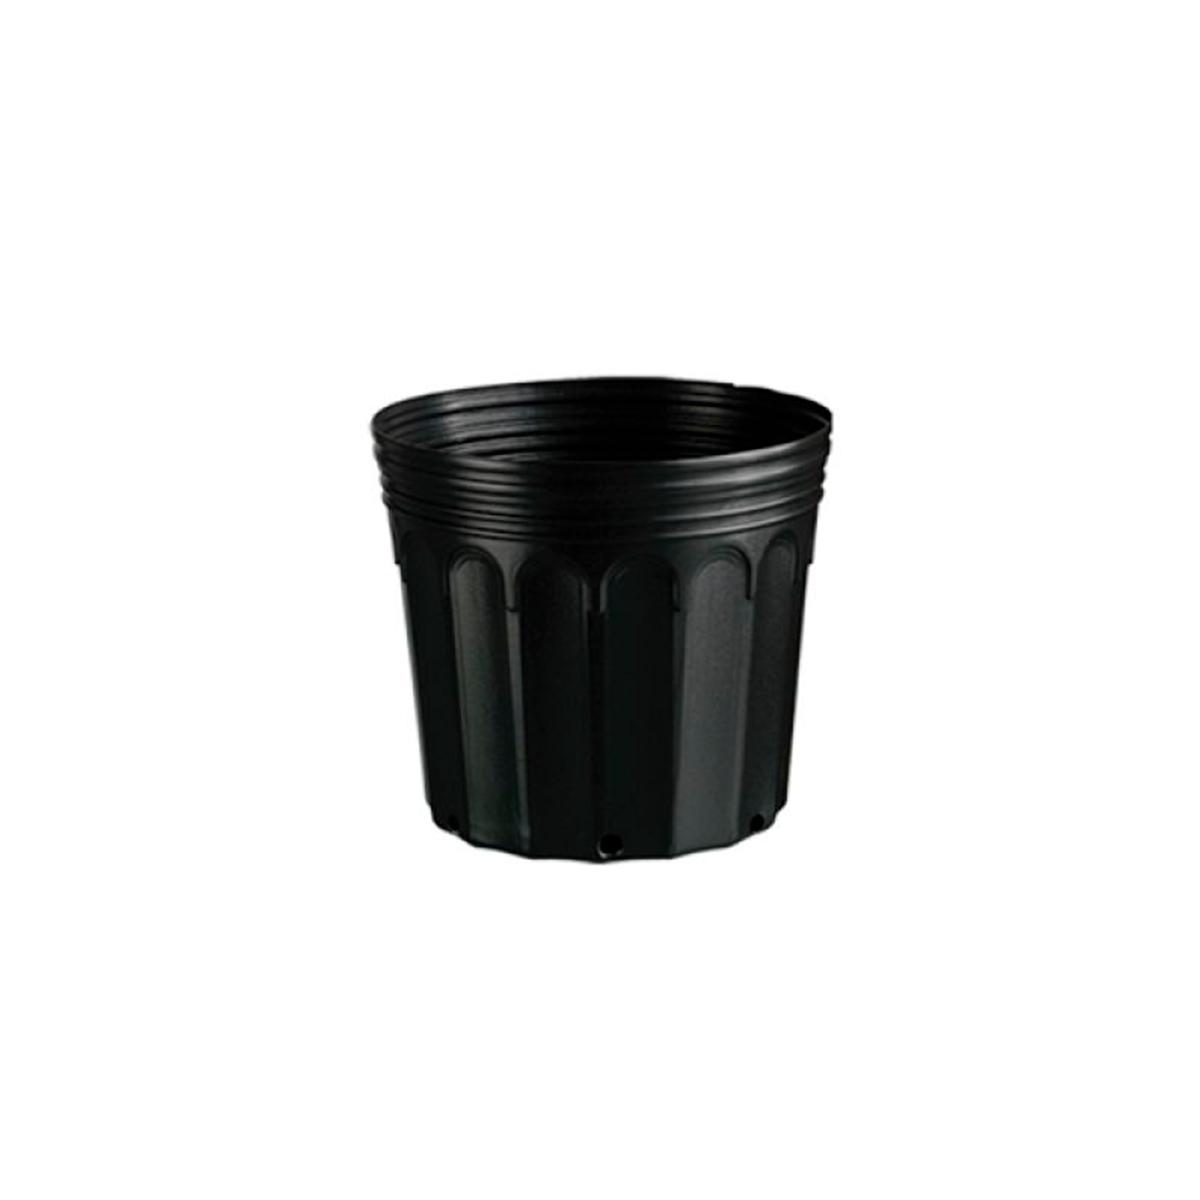 Kit 10 Embalagem para Mudas Flexível Plástico 8,5L